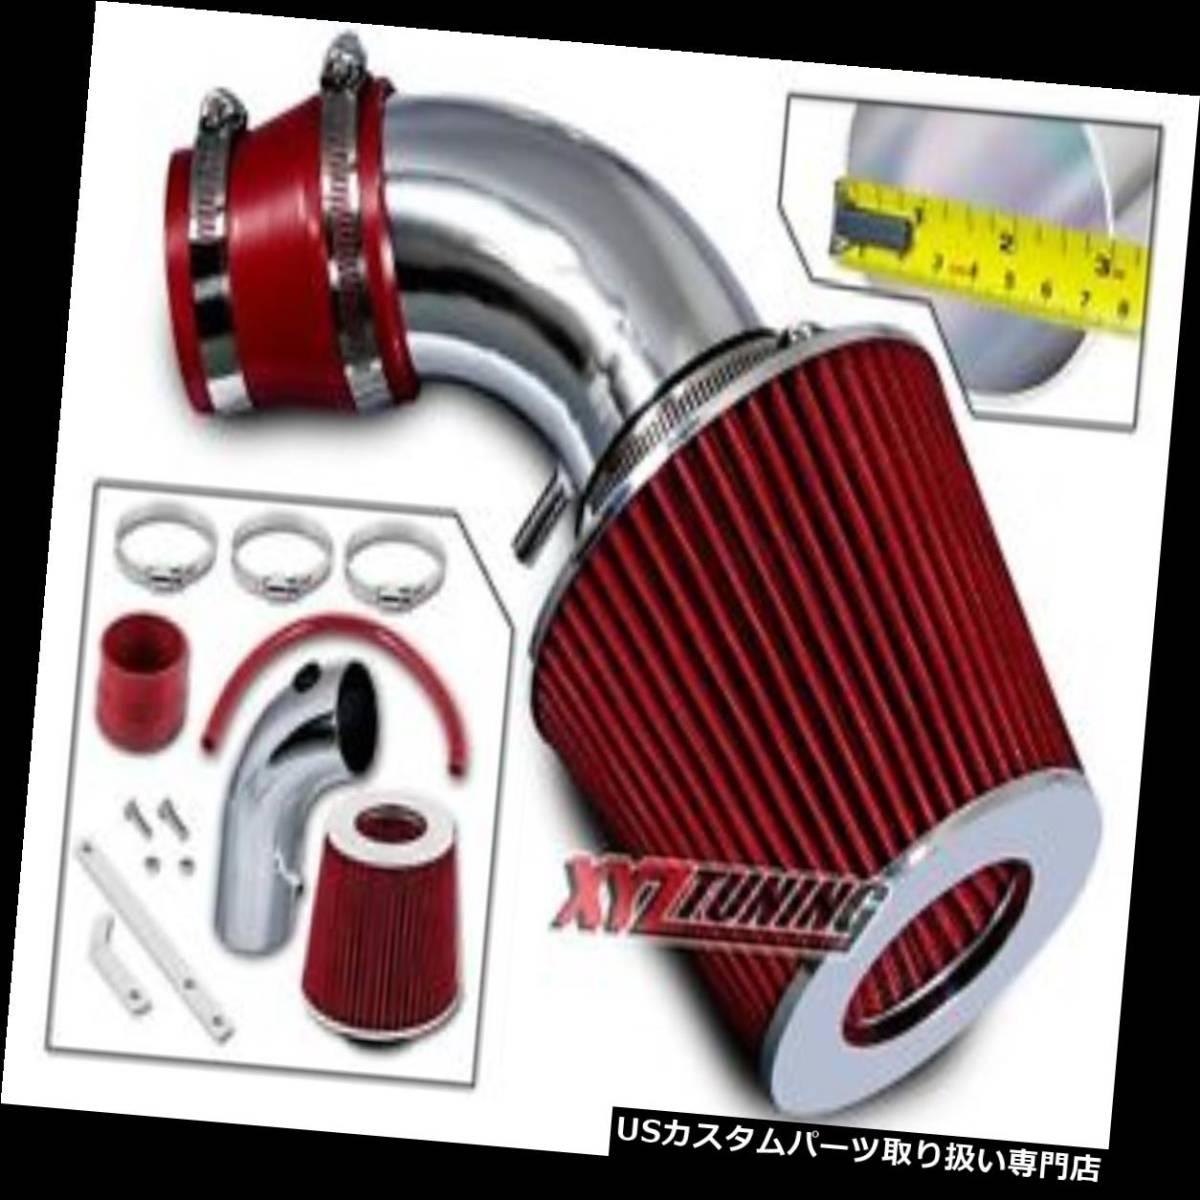 FILTER RED 2000-2005 CHEVY IMPALA MONTE CARLO 3.4 3.4L RAM AIR INTAKE KIT